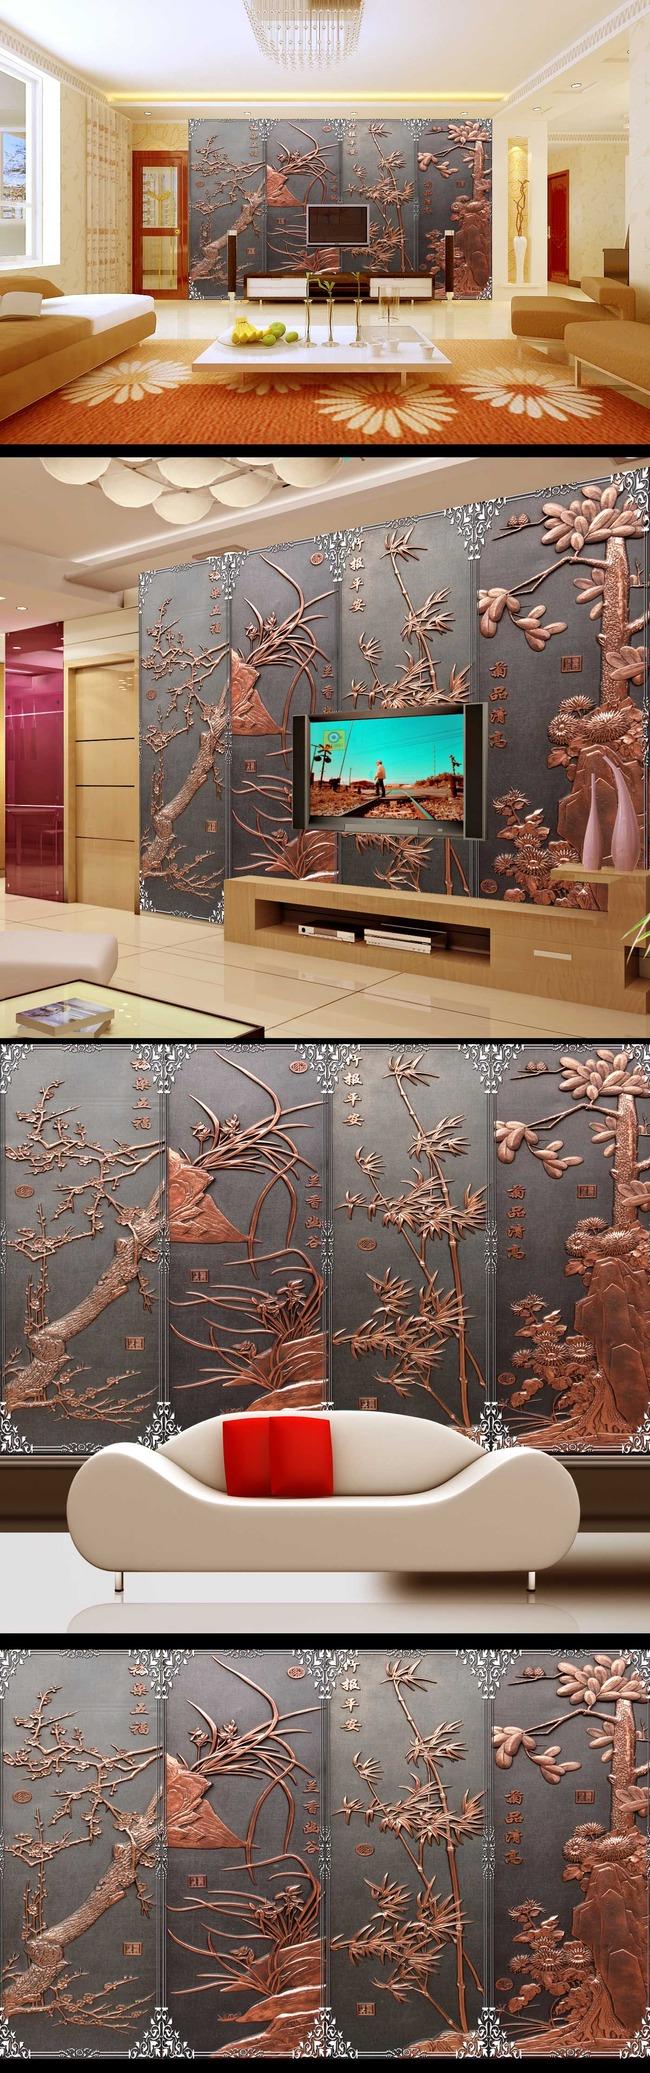 3d木雕浮雕梅兰竹菊古典玉石背景墙